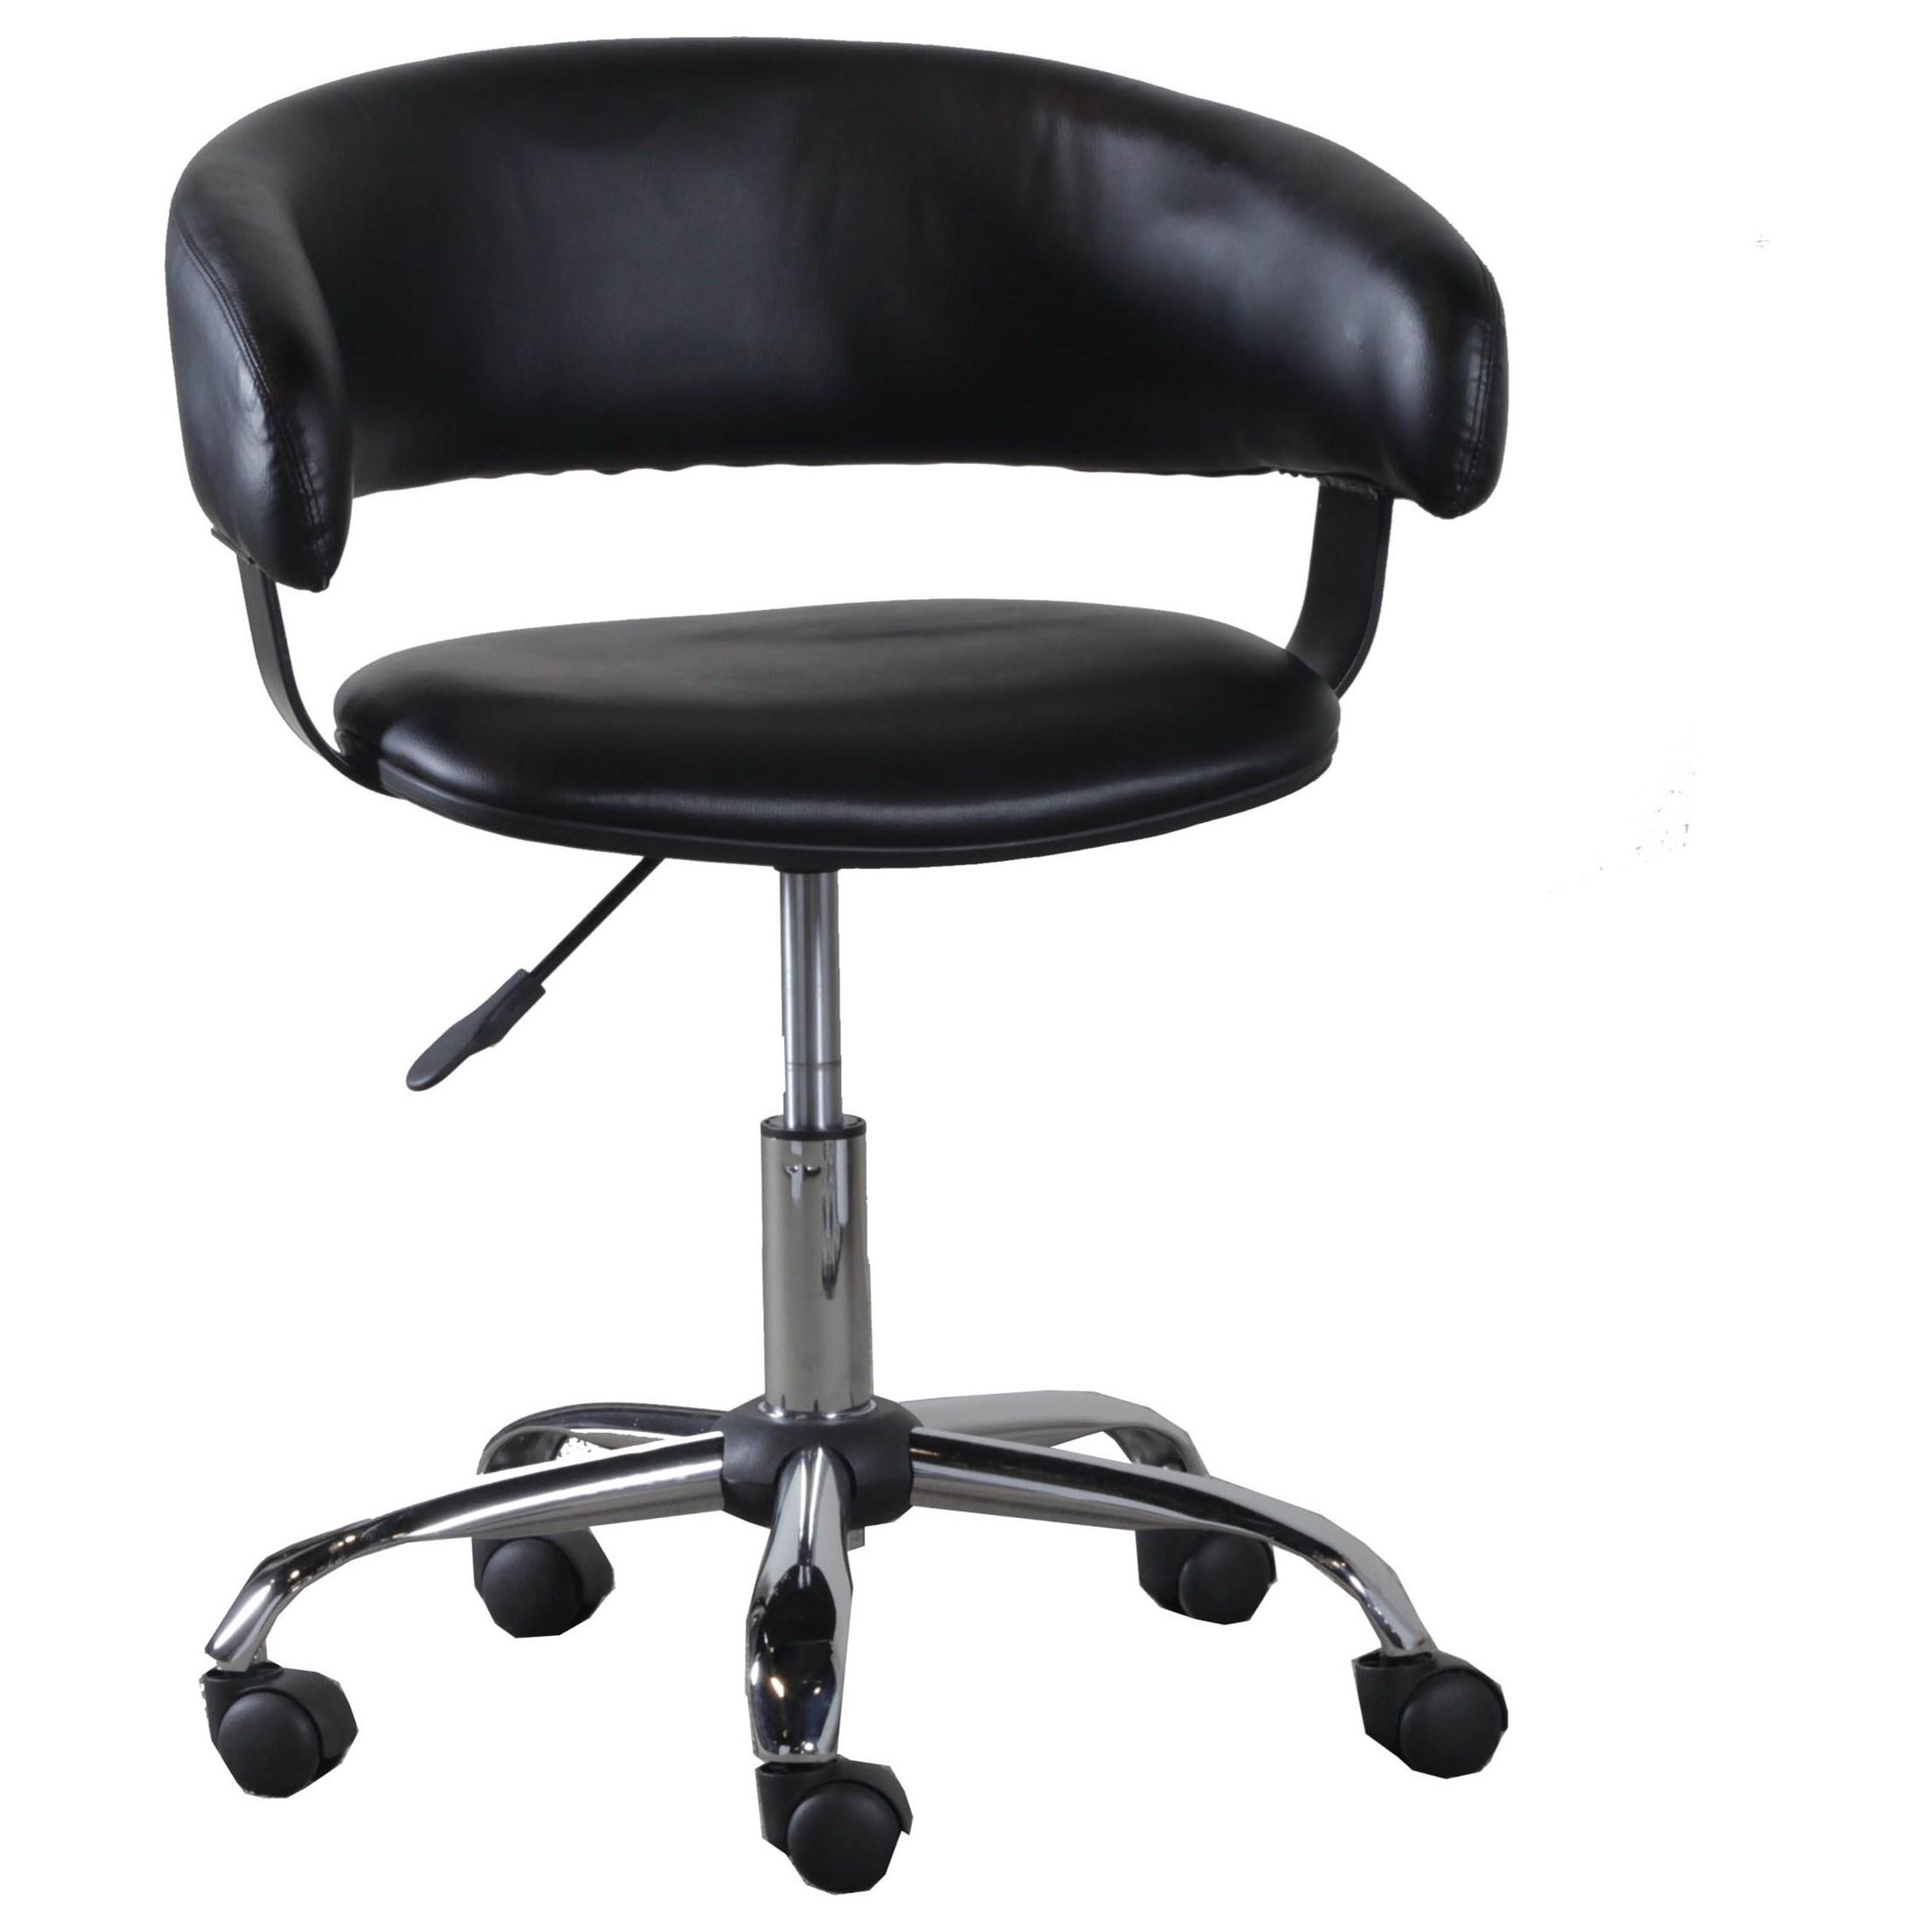 Accent Furniture Black Gas Lift Desk Chair by Powell at Lynn's Furniture & Mattress